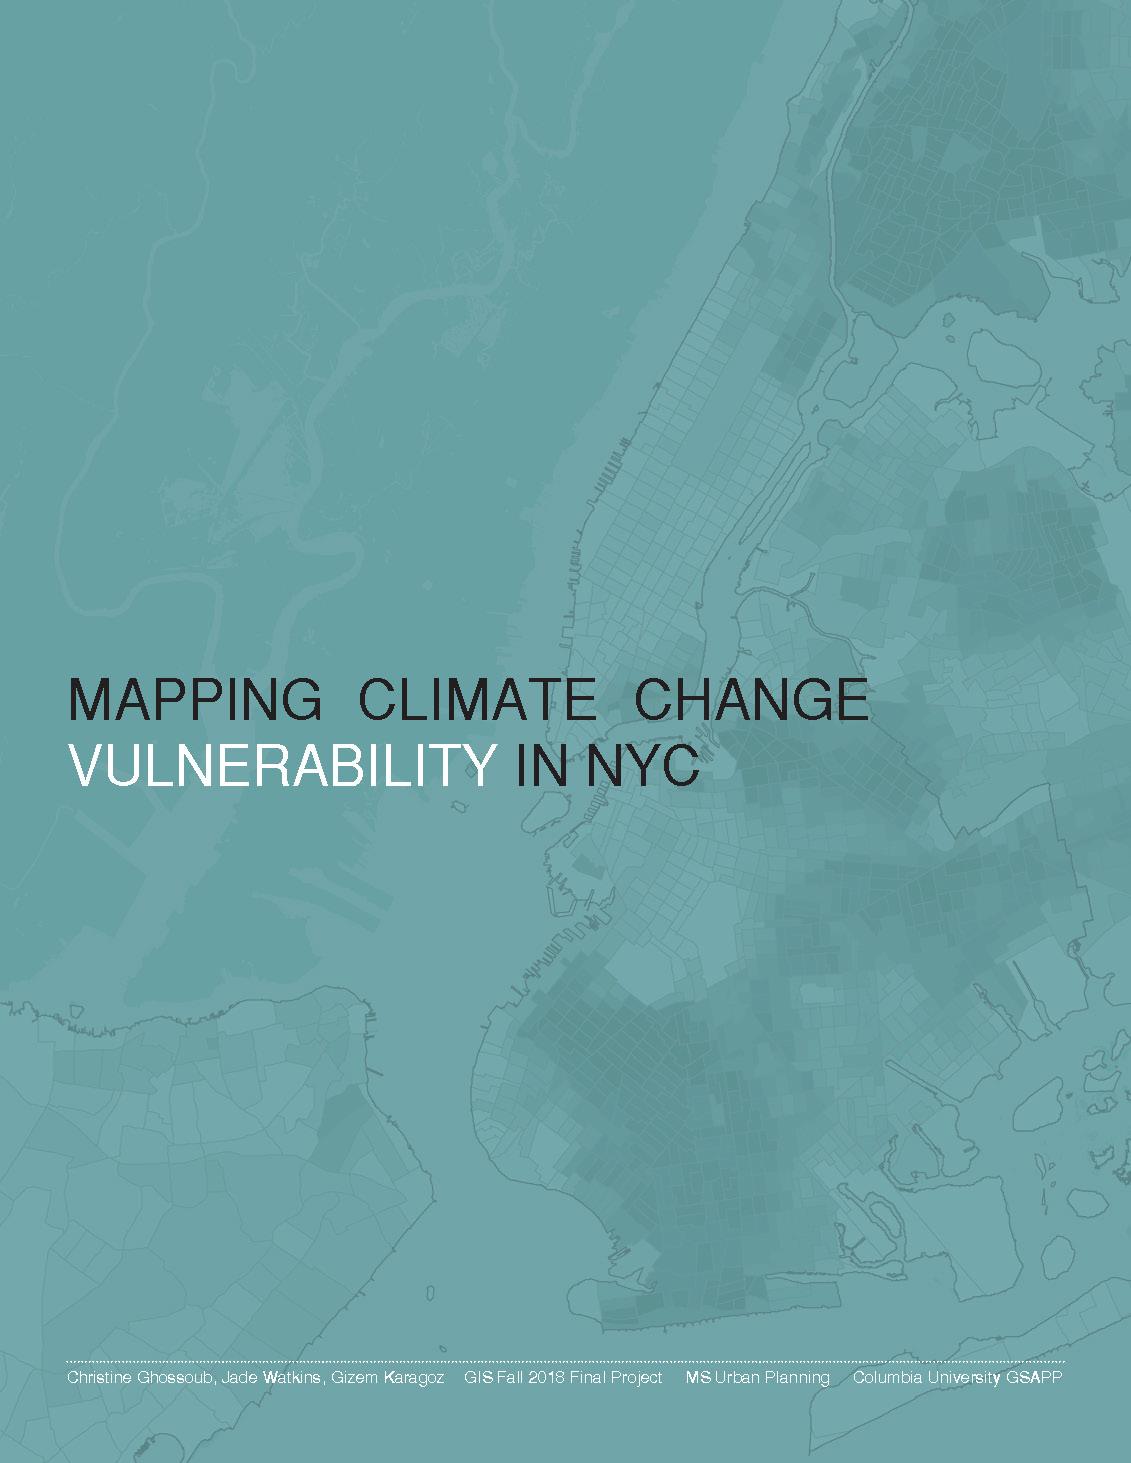 ClimateChangeVulnerability_P01.jpg